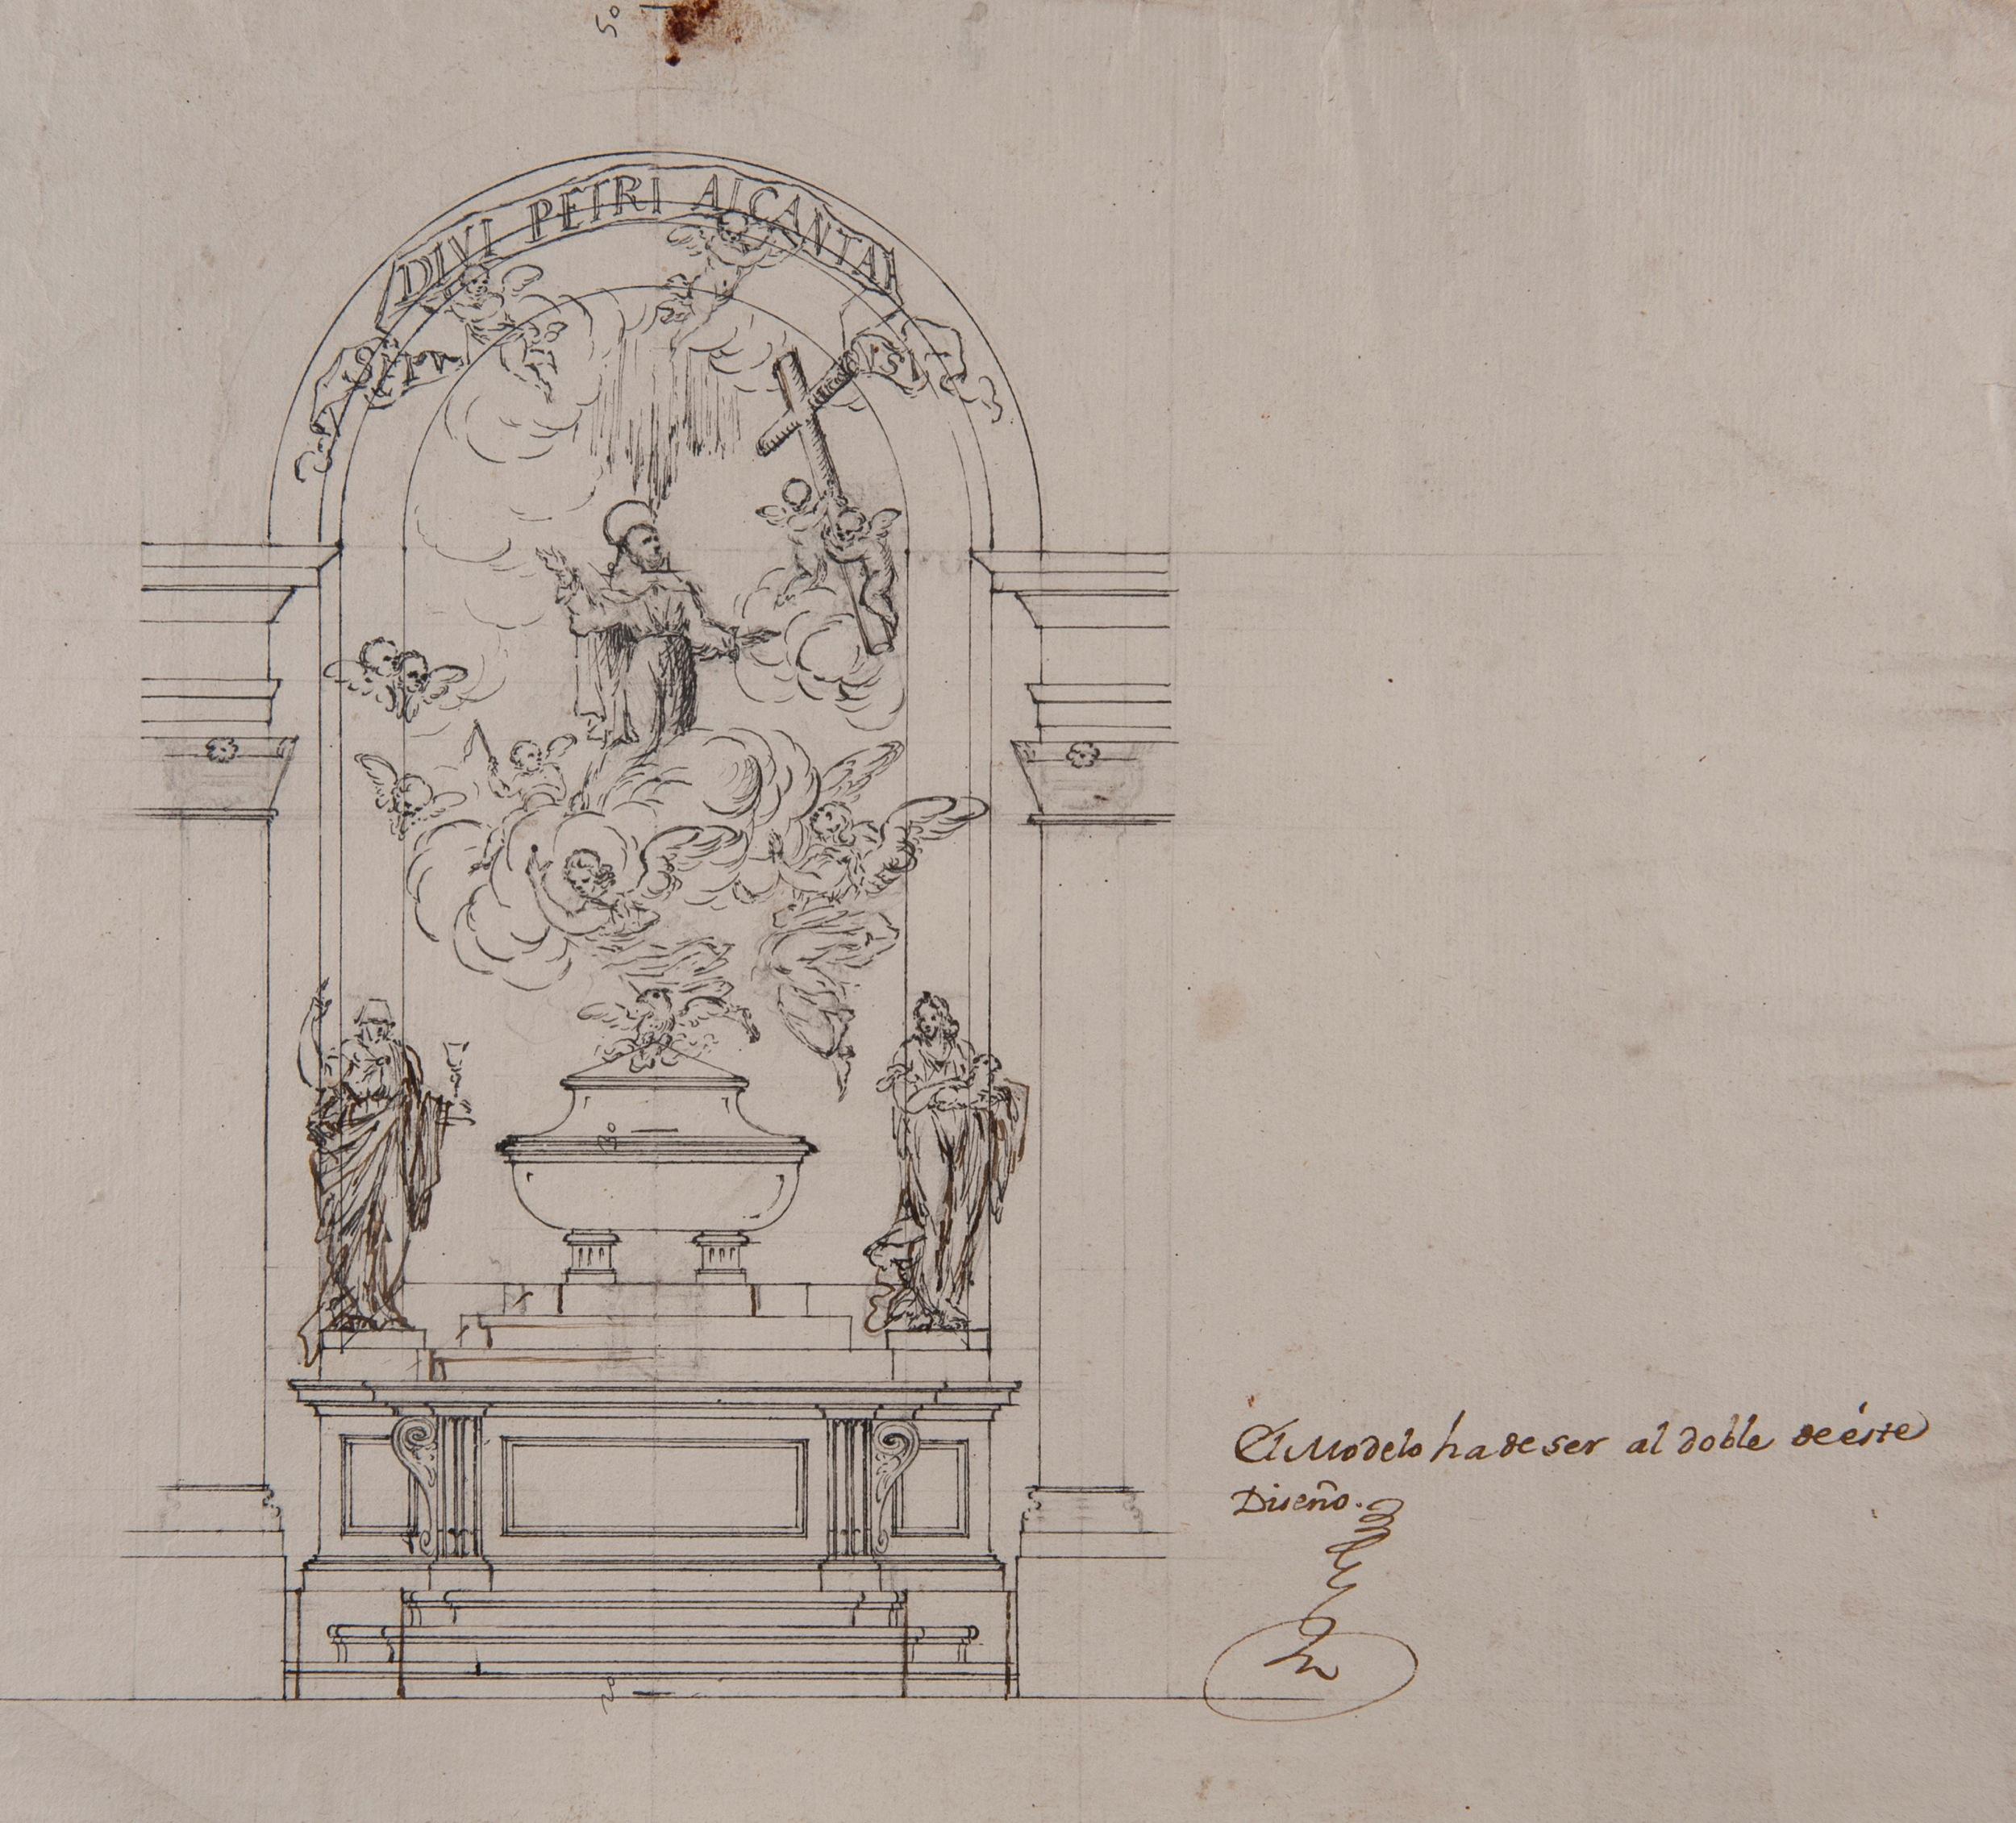 High Altar dedicated to Saint Peter of Alcántara - Francisco Gutiérrez